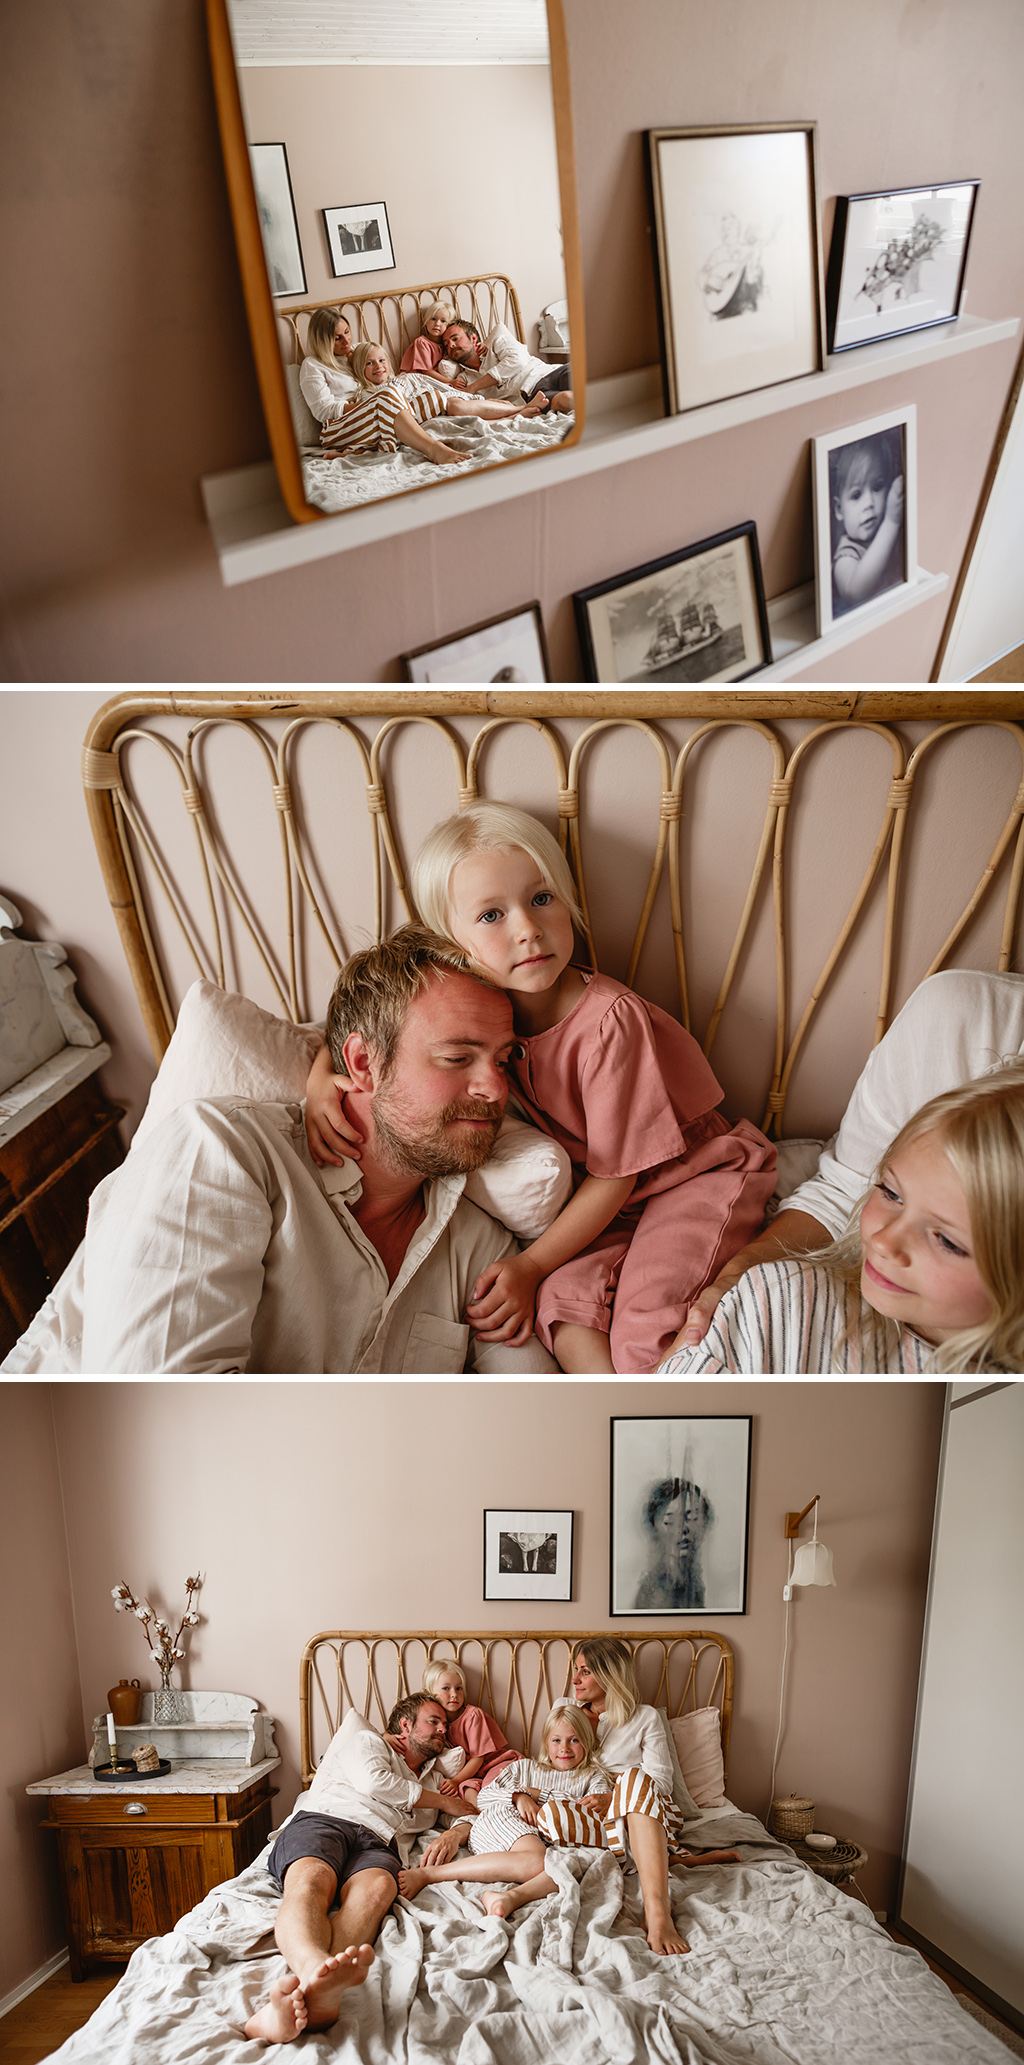 Lifestyle_familjefotografering_Stockholm_hemma-hos-fotografering_lifestyle-inhome-session_3.jpg